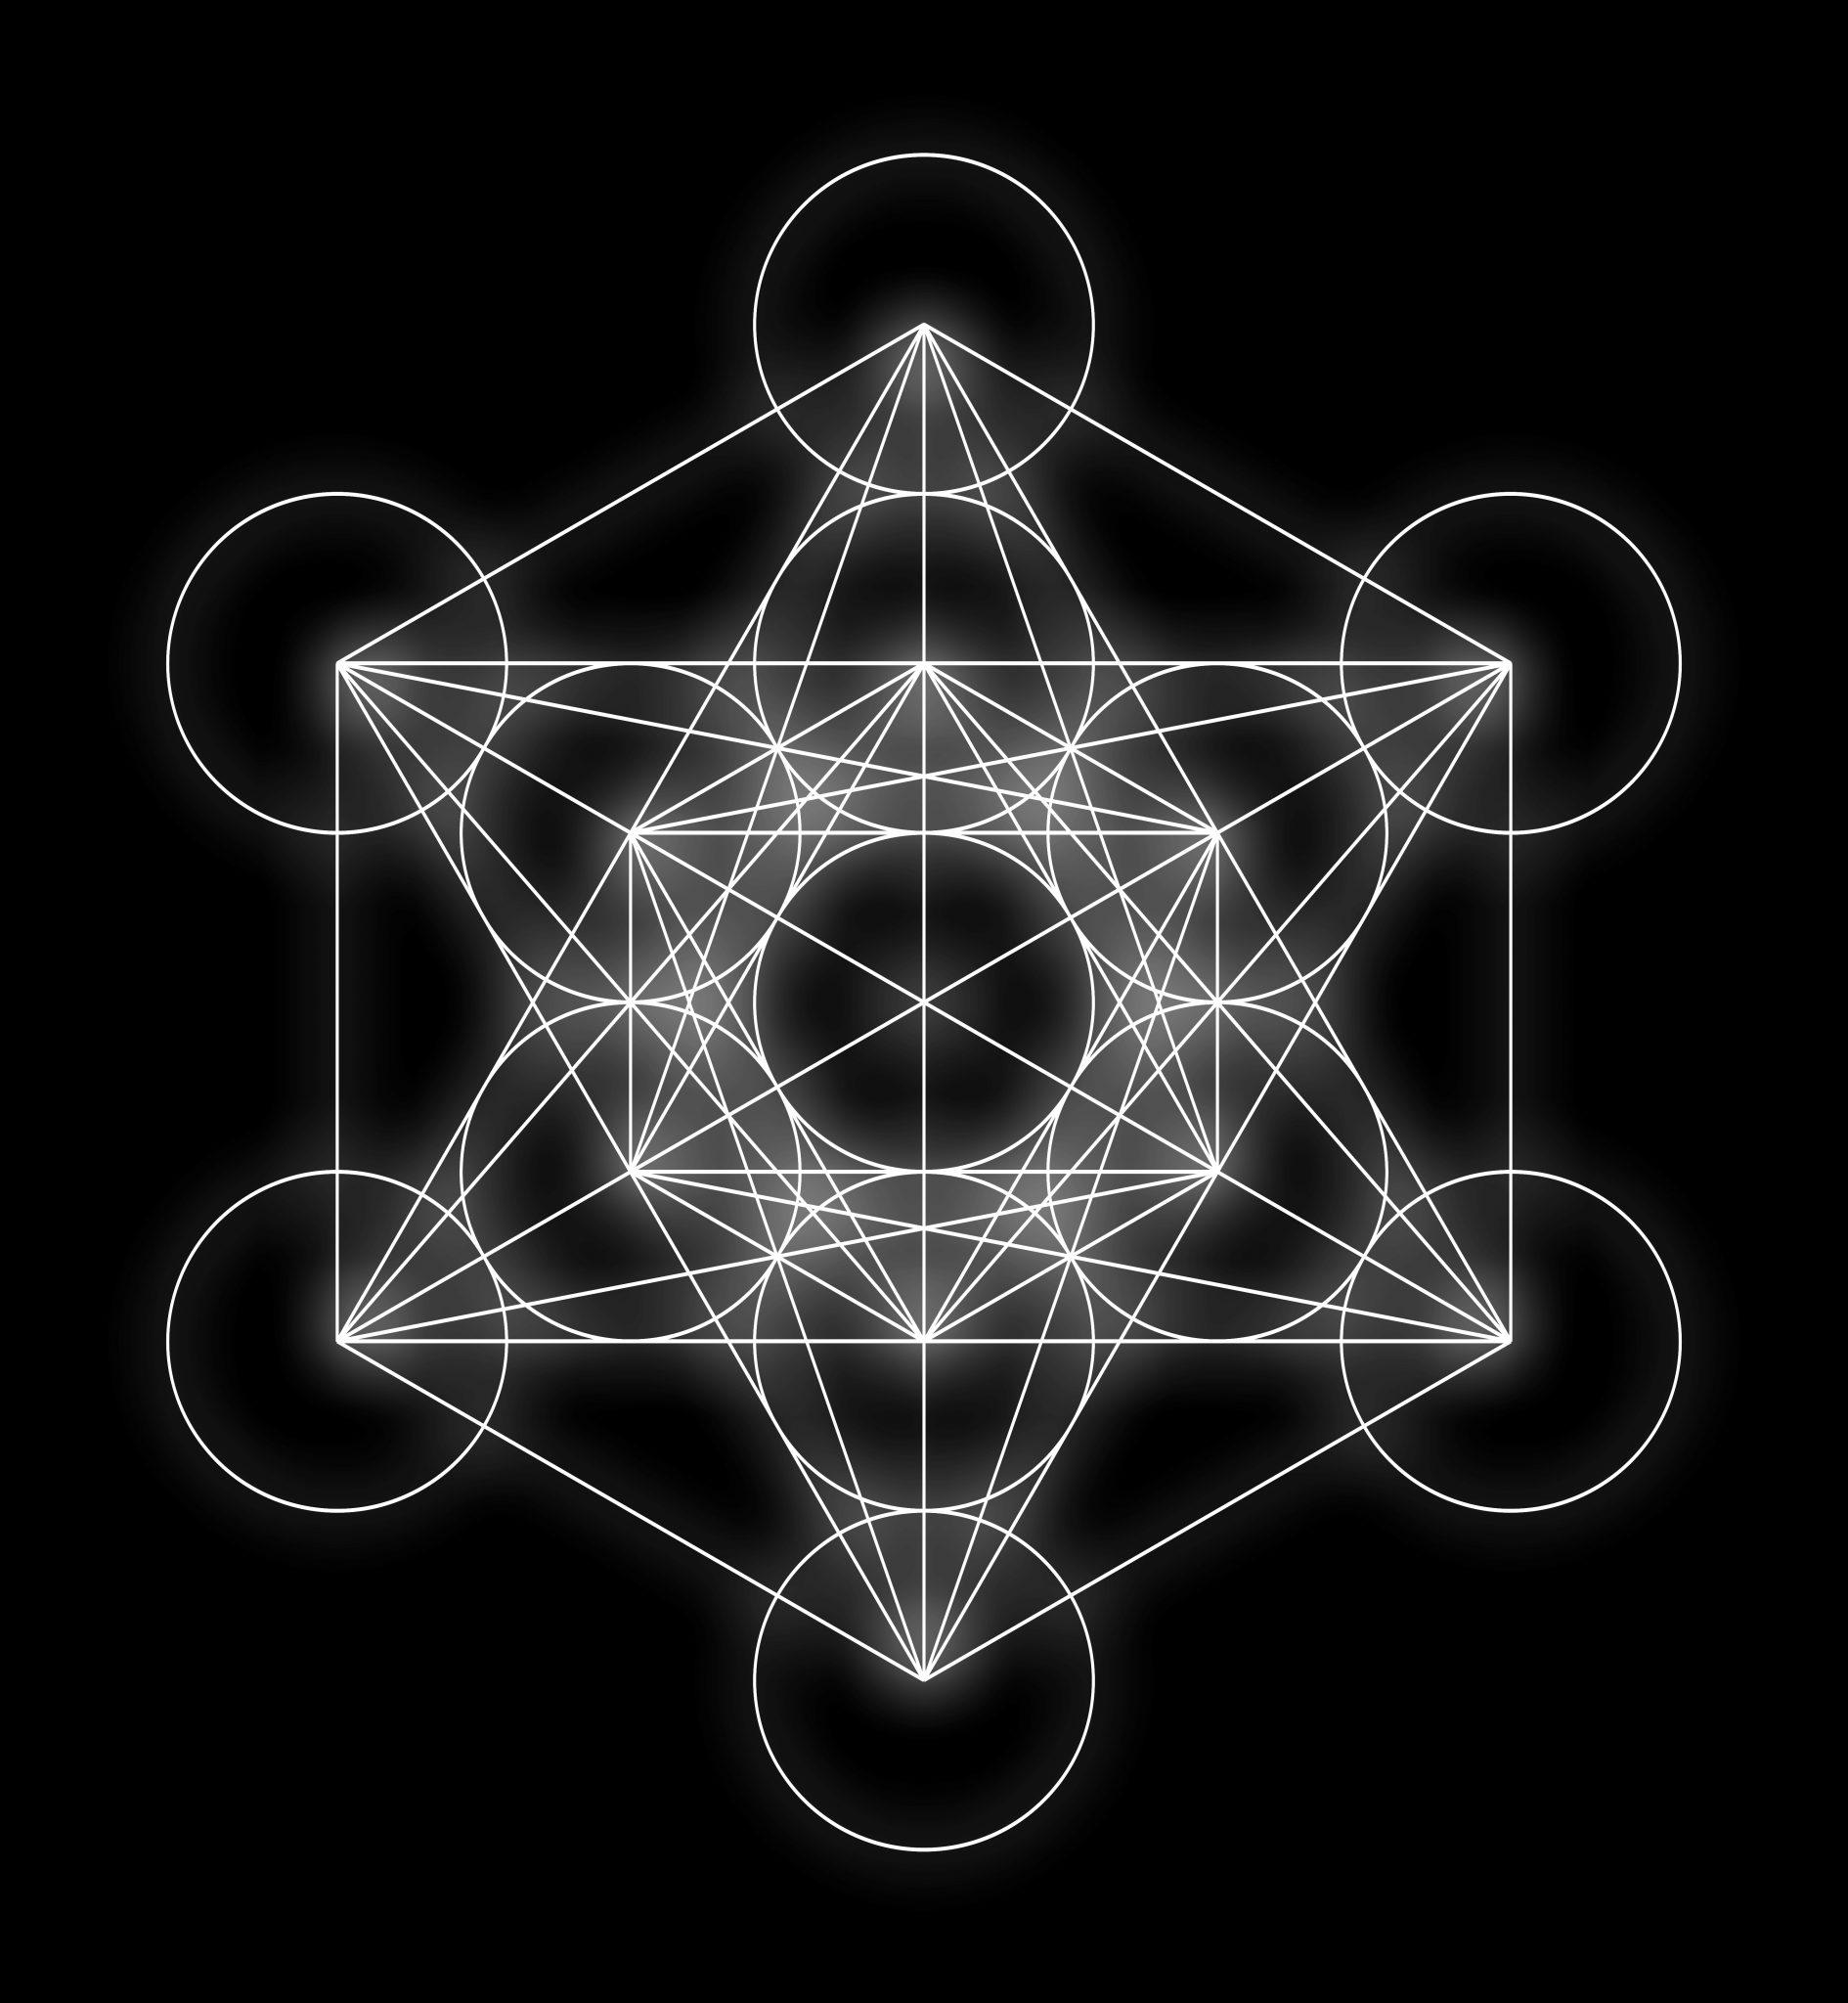 metatron's cube, sacred geometry, crystals, third eye,